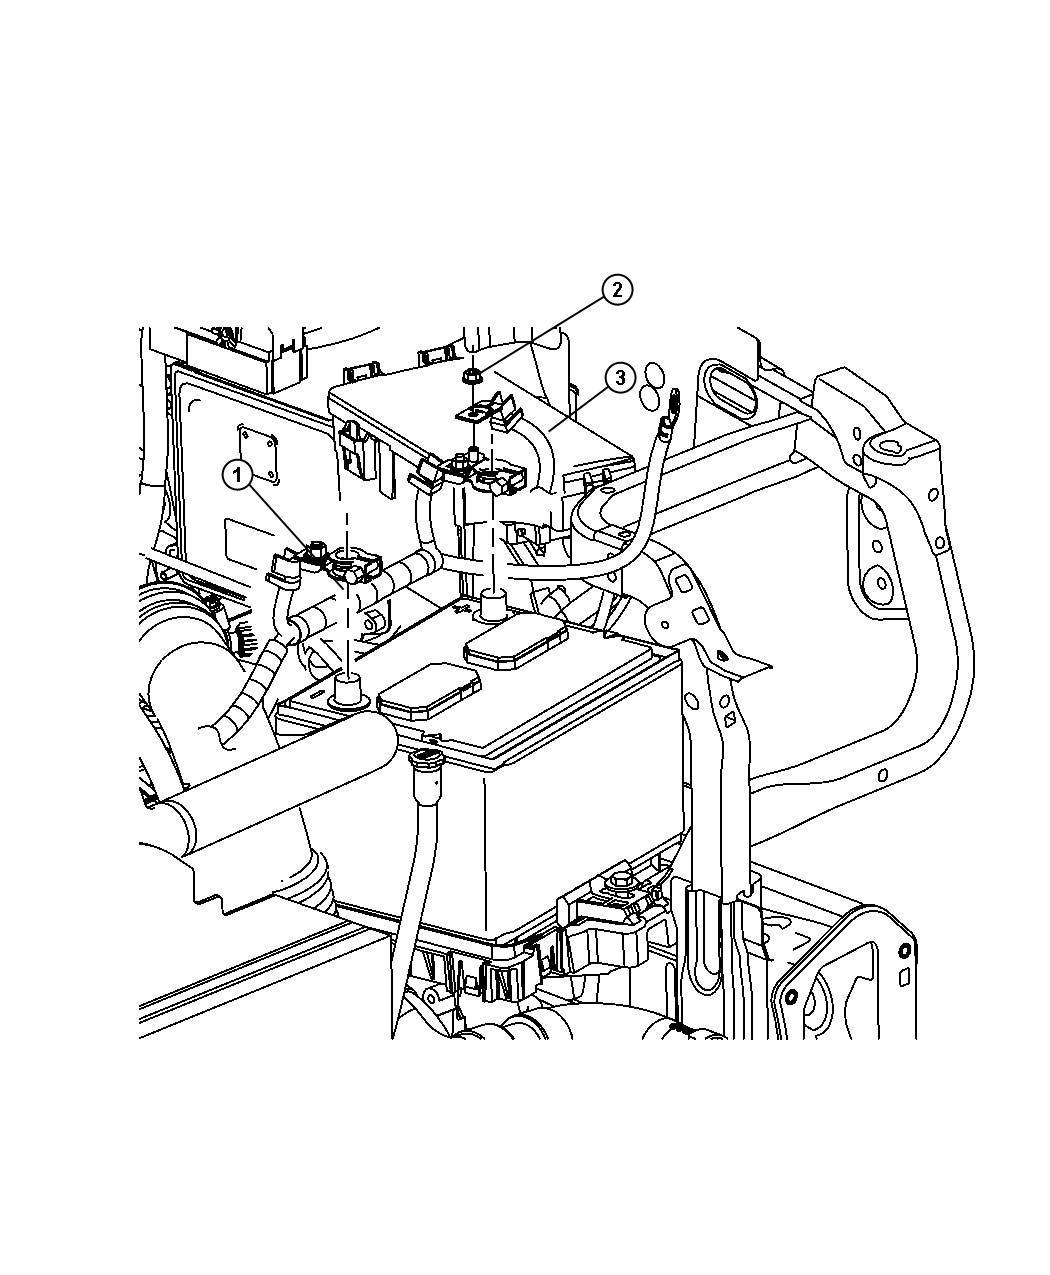 Dodge Caliber Battery Wiring